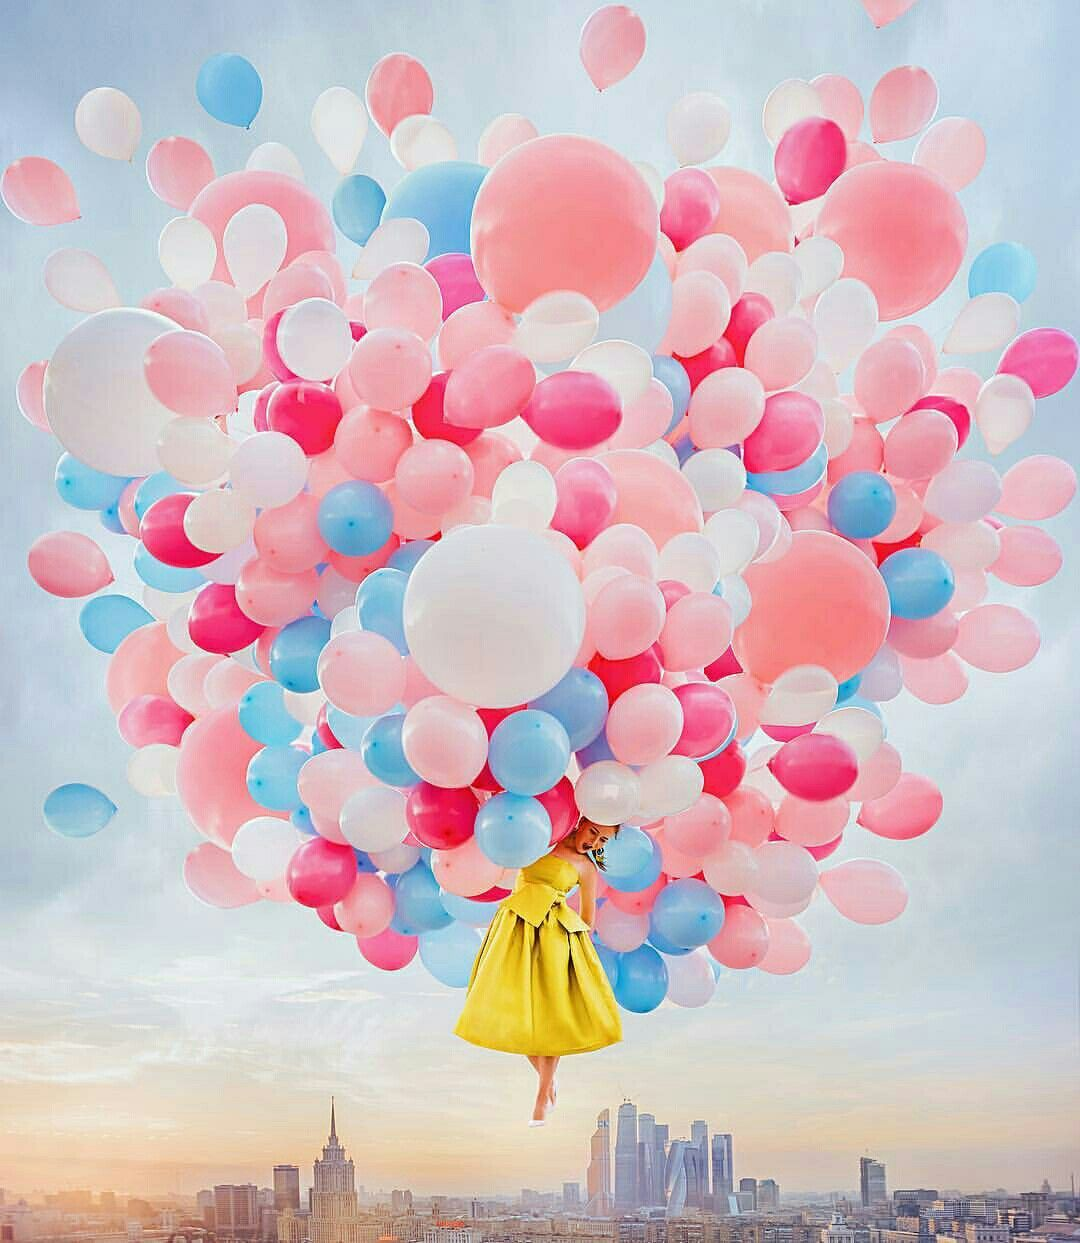 Pin By Yuriko Moro On Balloon Balloons Photography Tumblr Photography Balloons